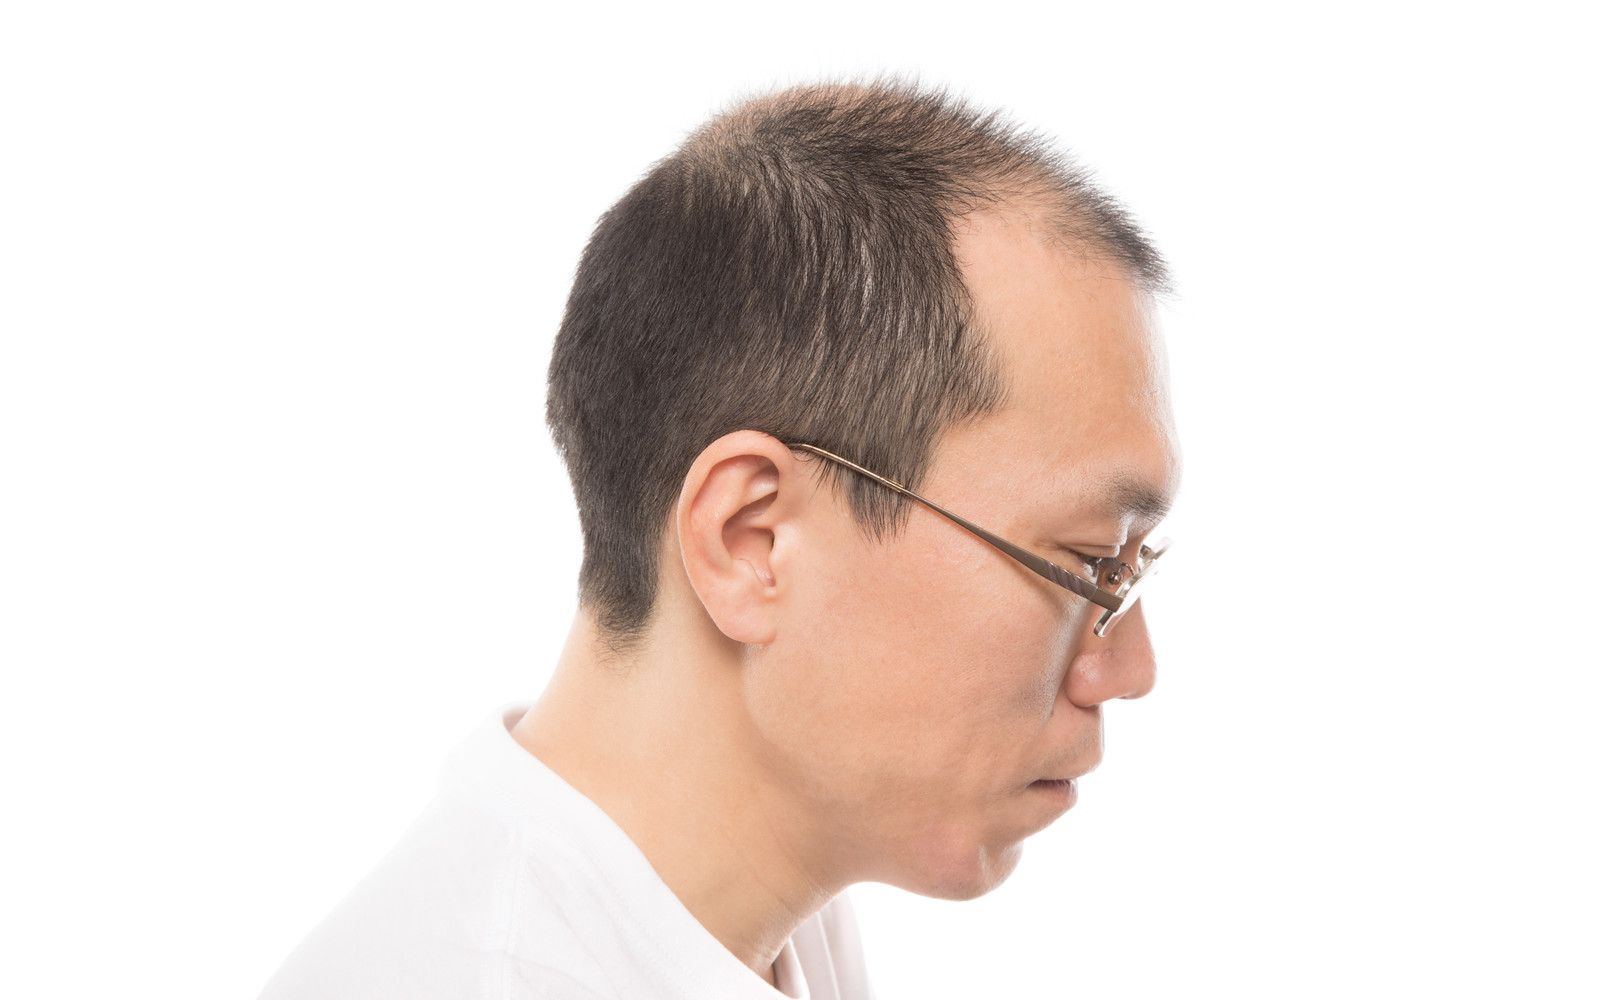 「M字ハゲの男性(横顔)」の写真[モデル:サンライズ鈴木]